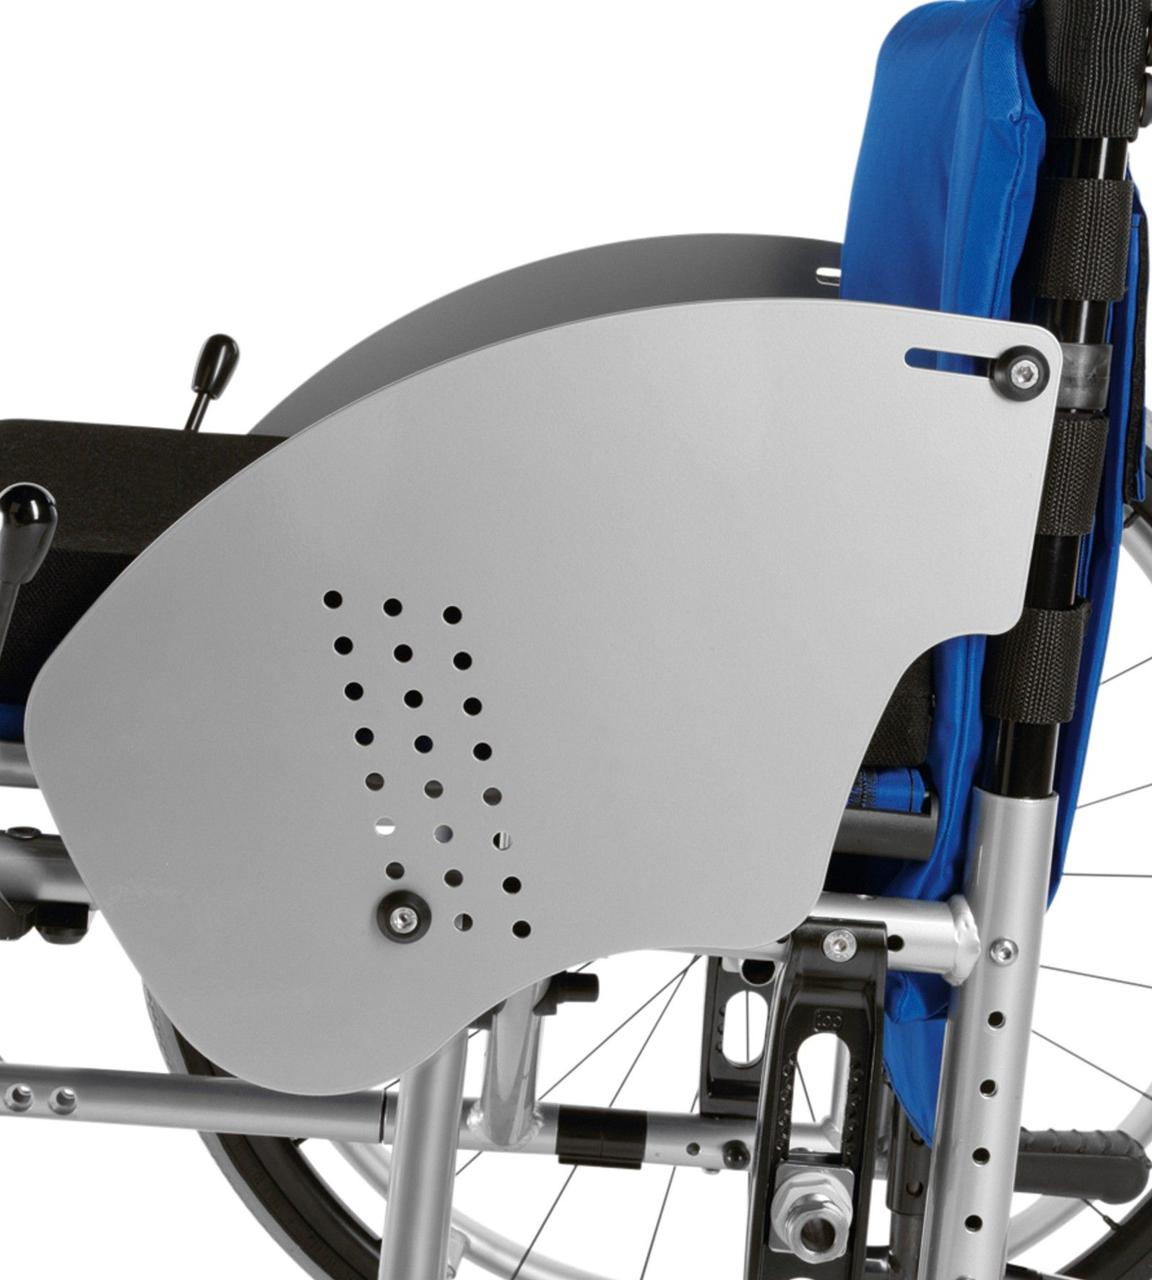 Кресло-коляска Otto Bock АВАНГАРД ТИН активного типа для детей и подростков - фото 3